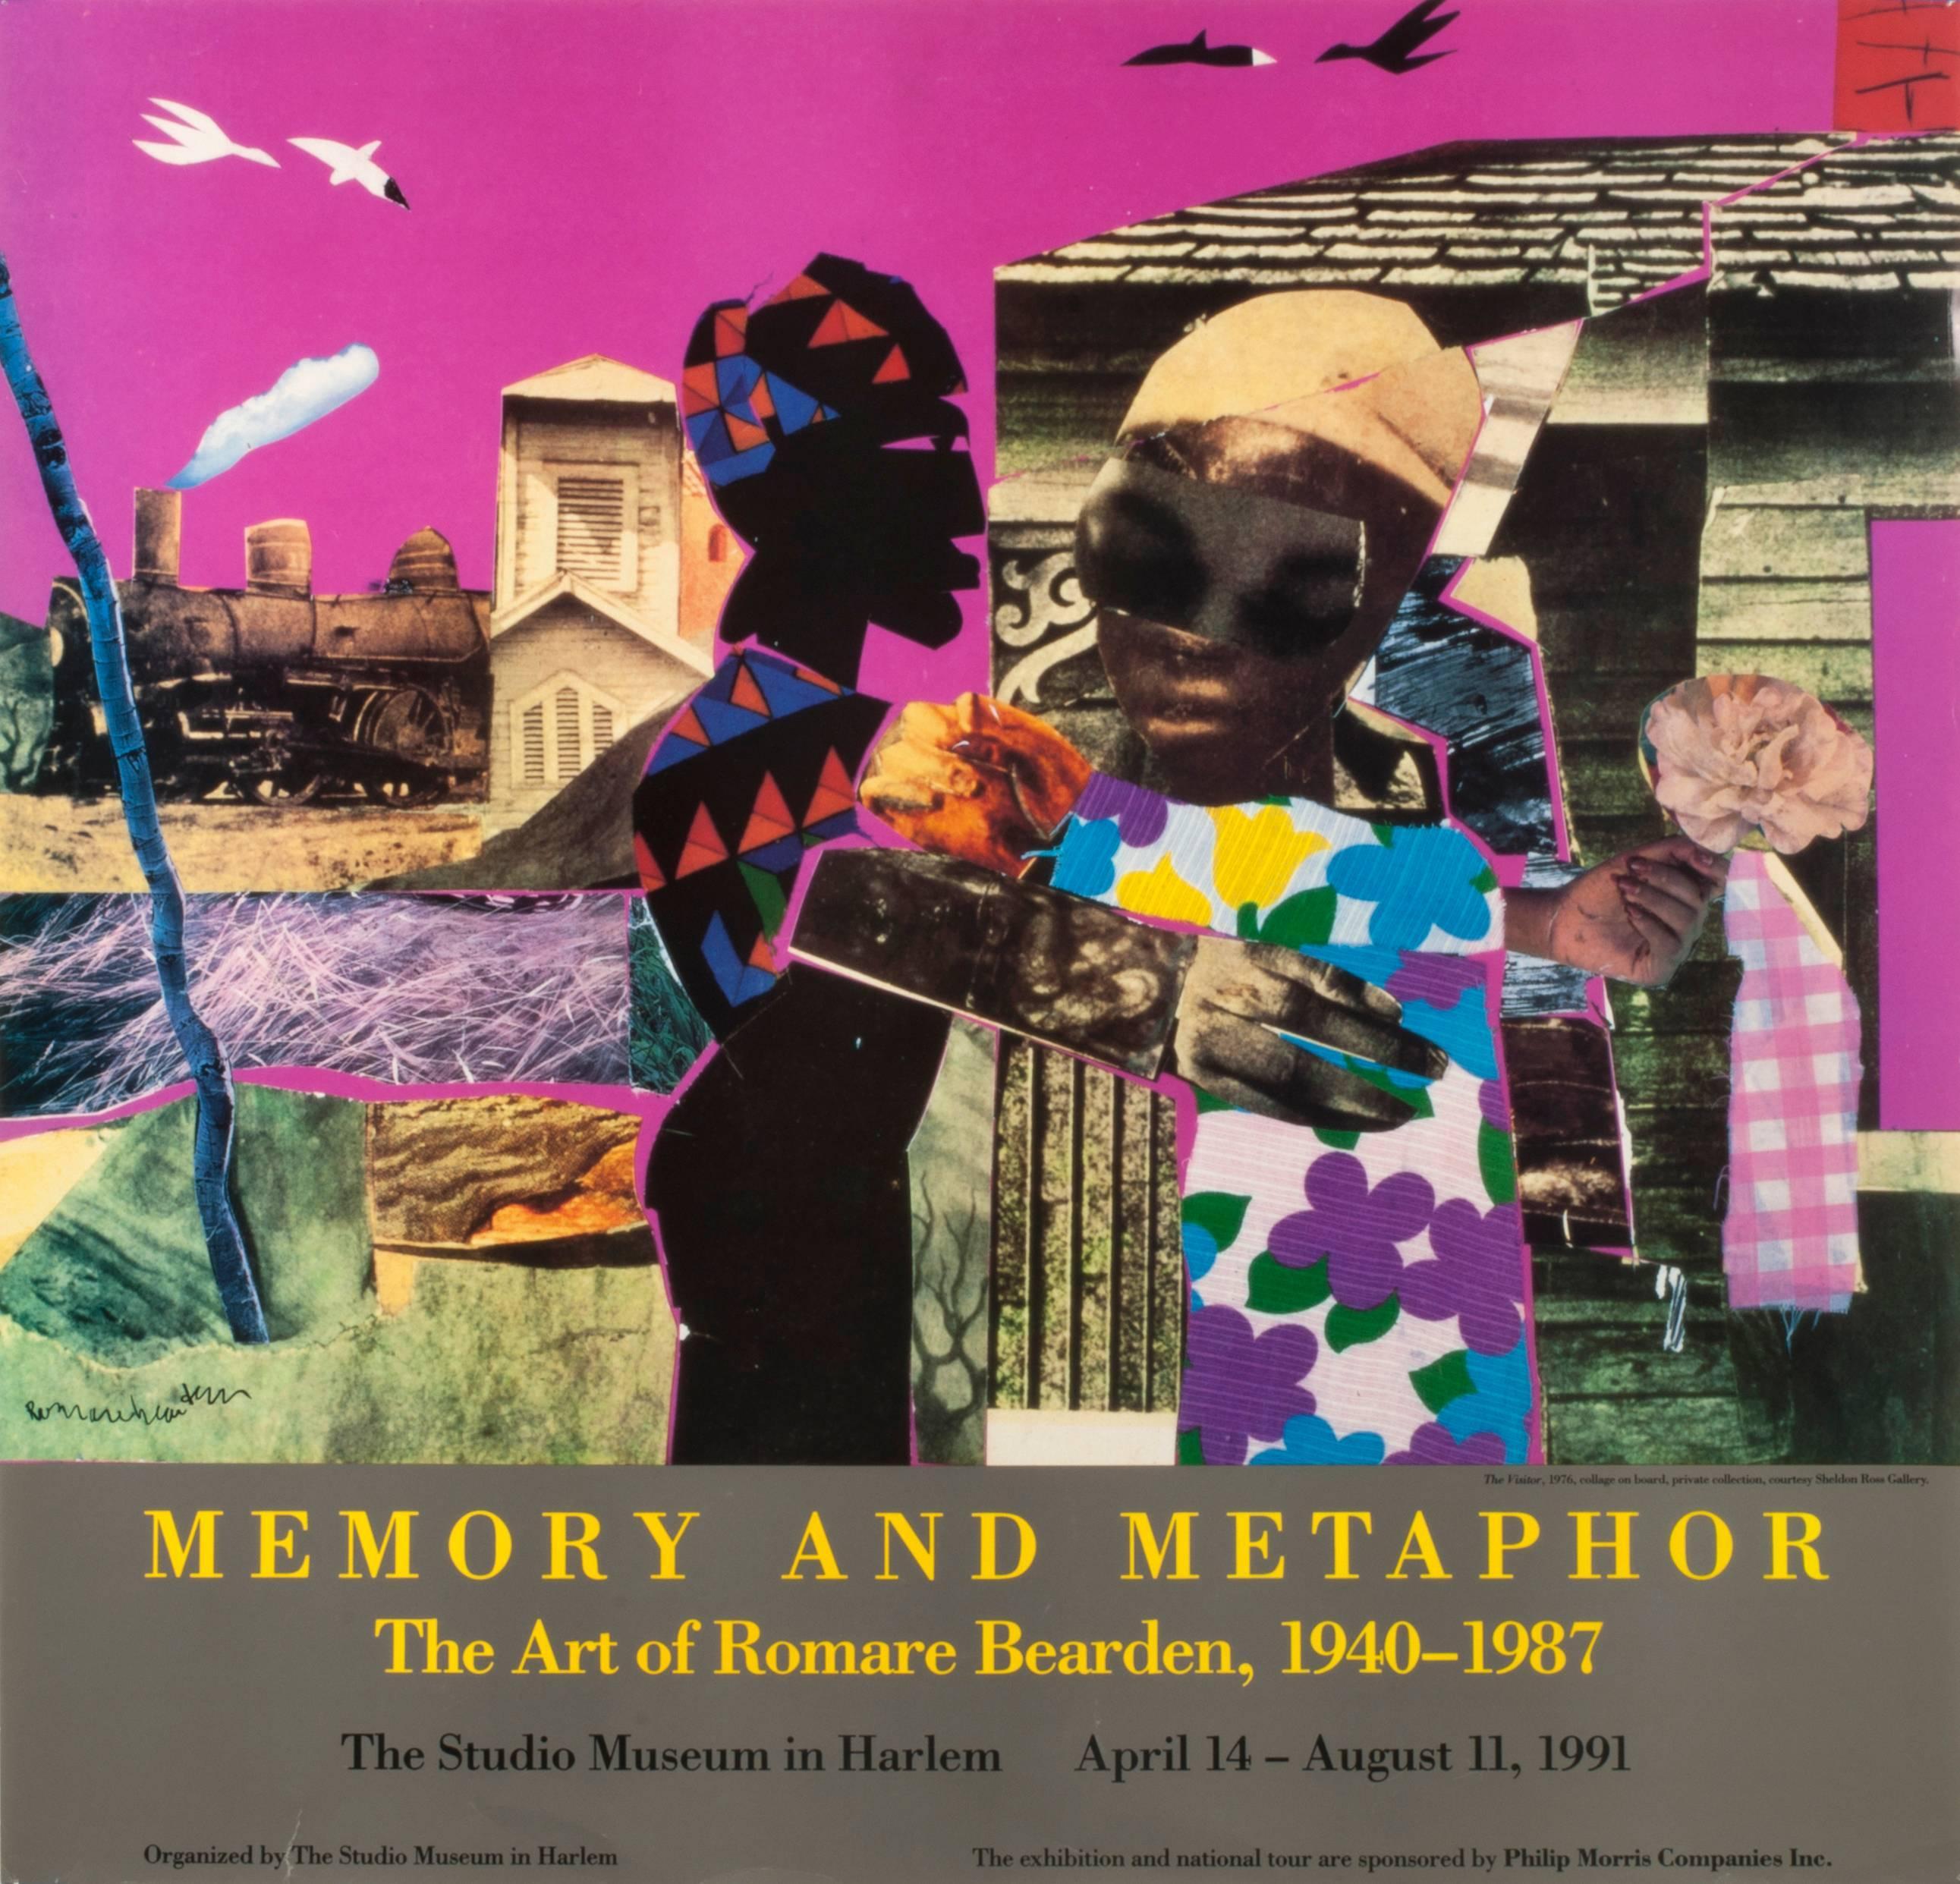 Memory and Metaphor, The Art of Romare Bearden